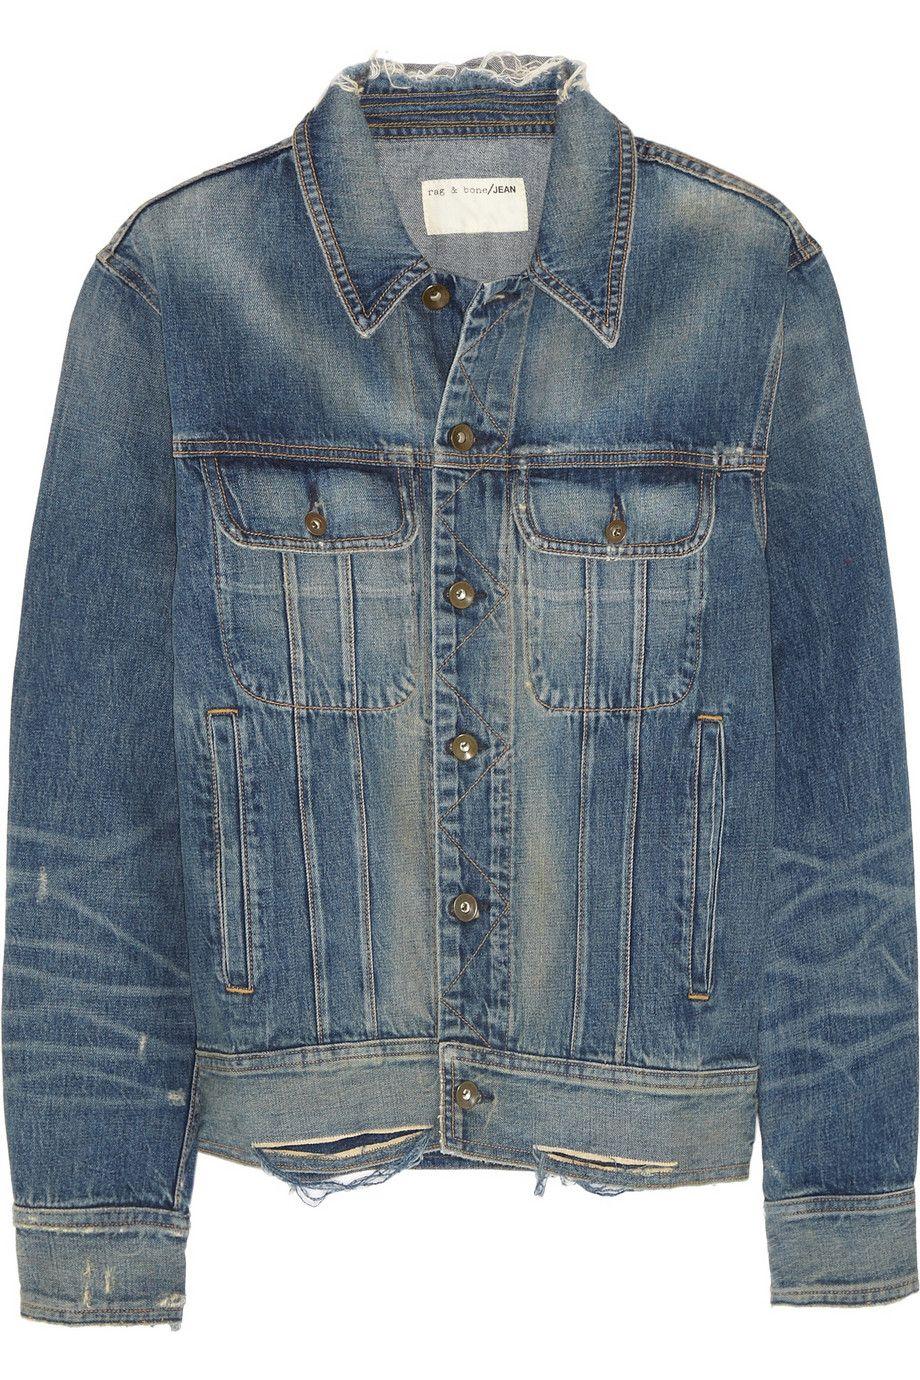 Rag Bone Boyfriend Distressed Denim Jacket Net A Porter Com Distressed Denim Jacket Distressed Denim Petite Denim Jacket